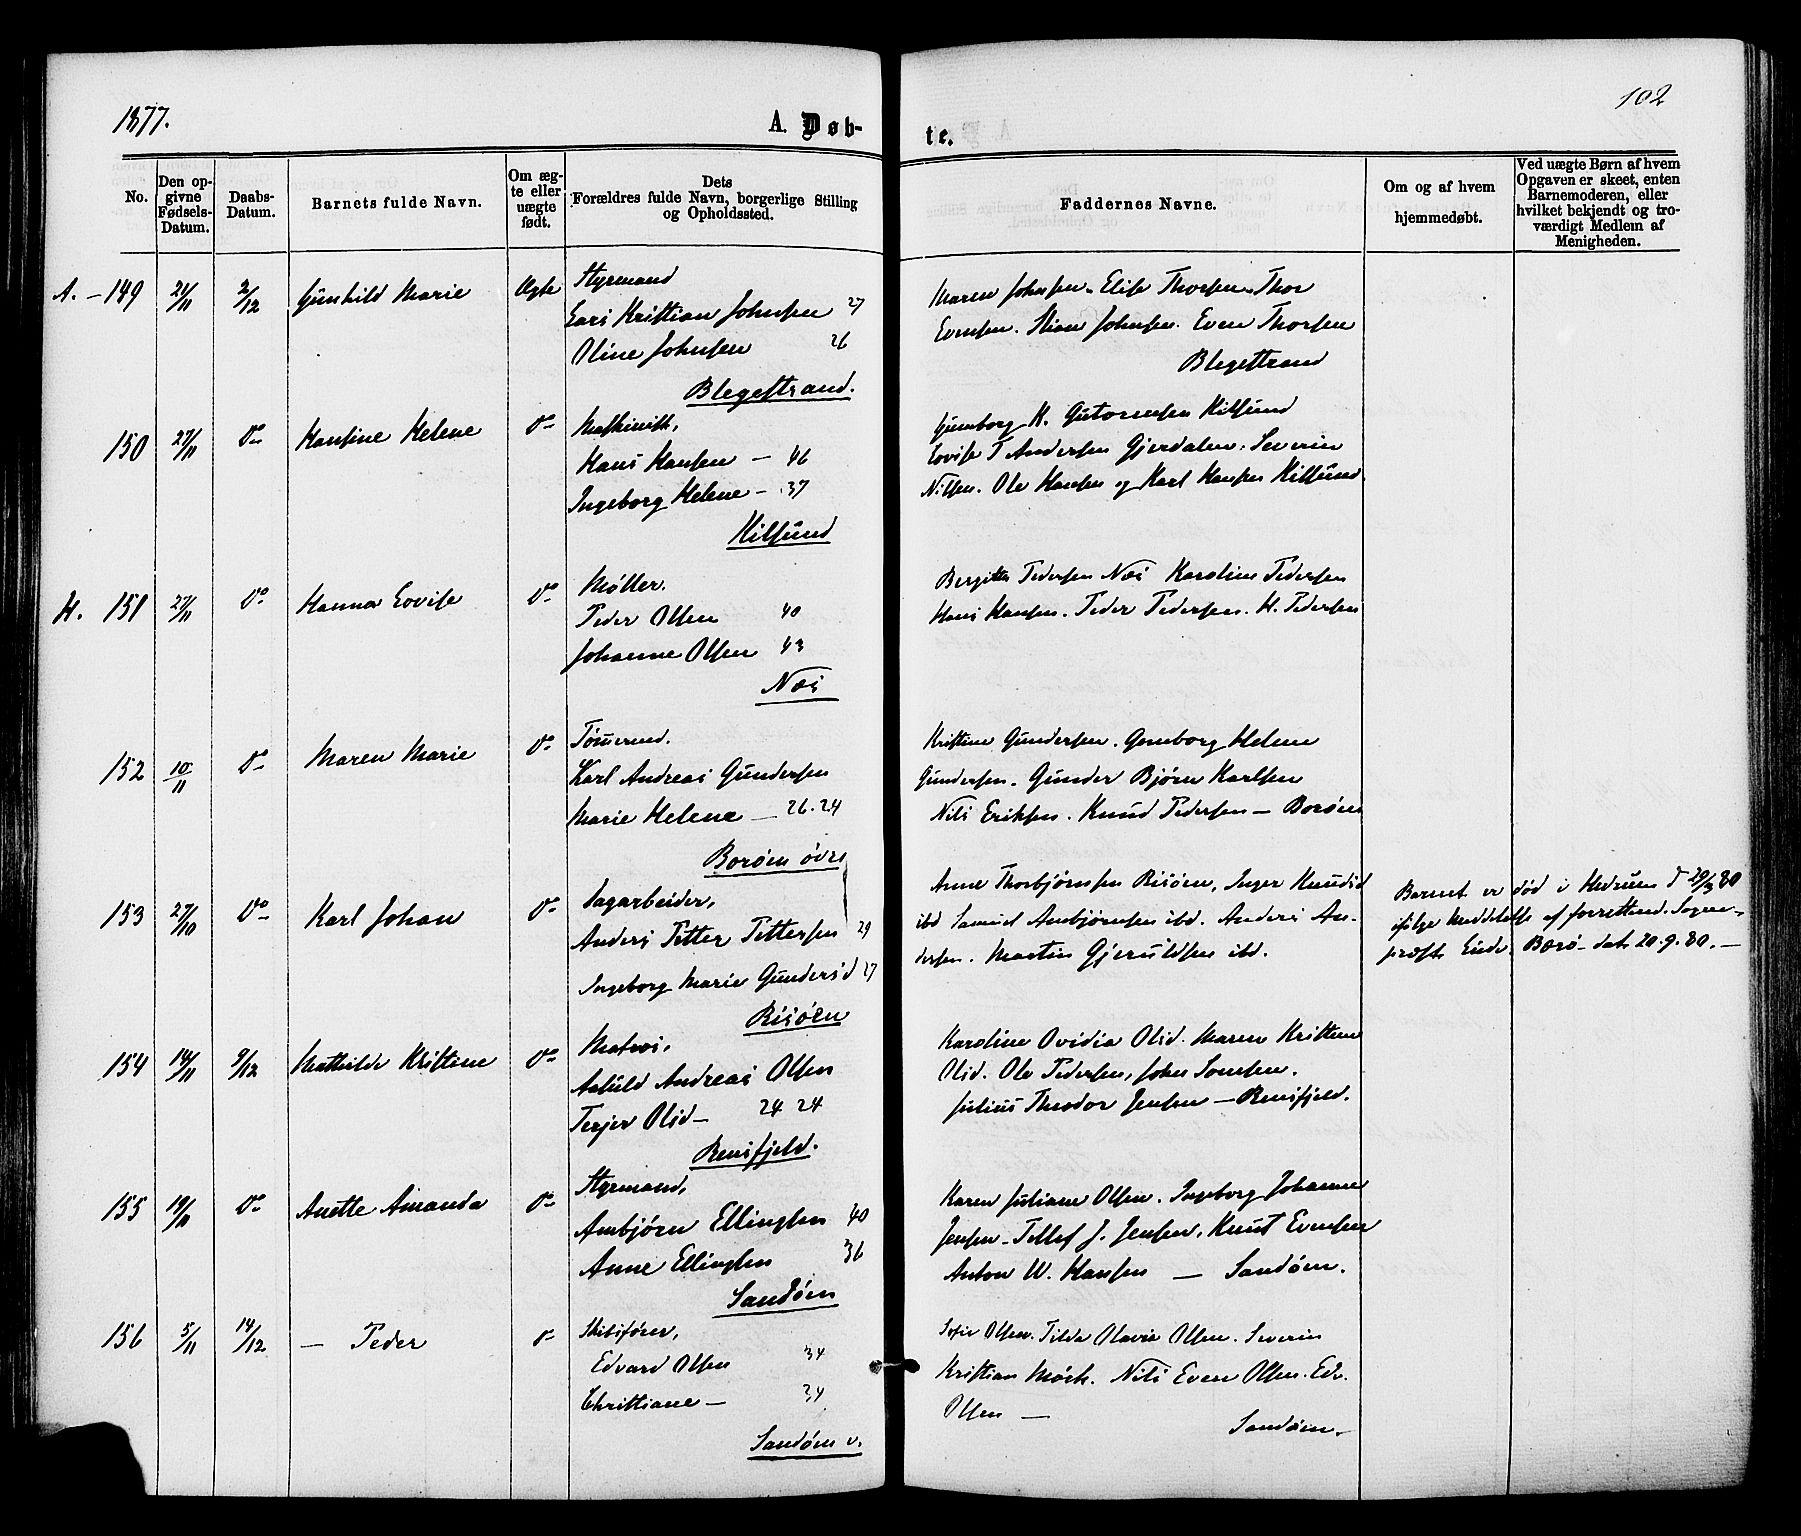 SAK, Dypvåg sokneprestkontor, F/Fa/Faa/L0007: Ministerialbok nr. A 7/ 1, 1872-1884, s. 102